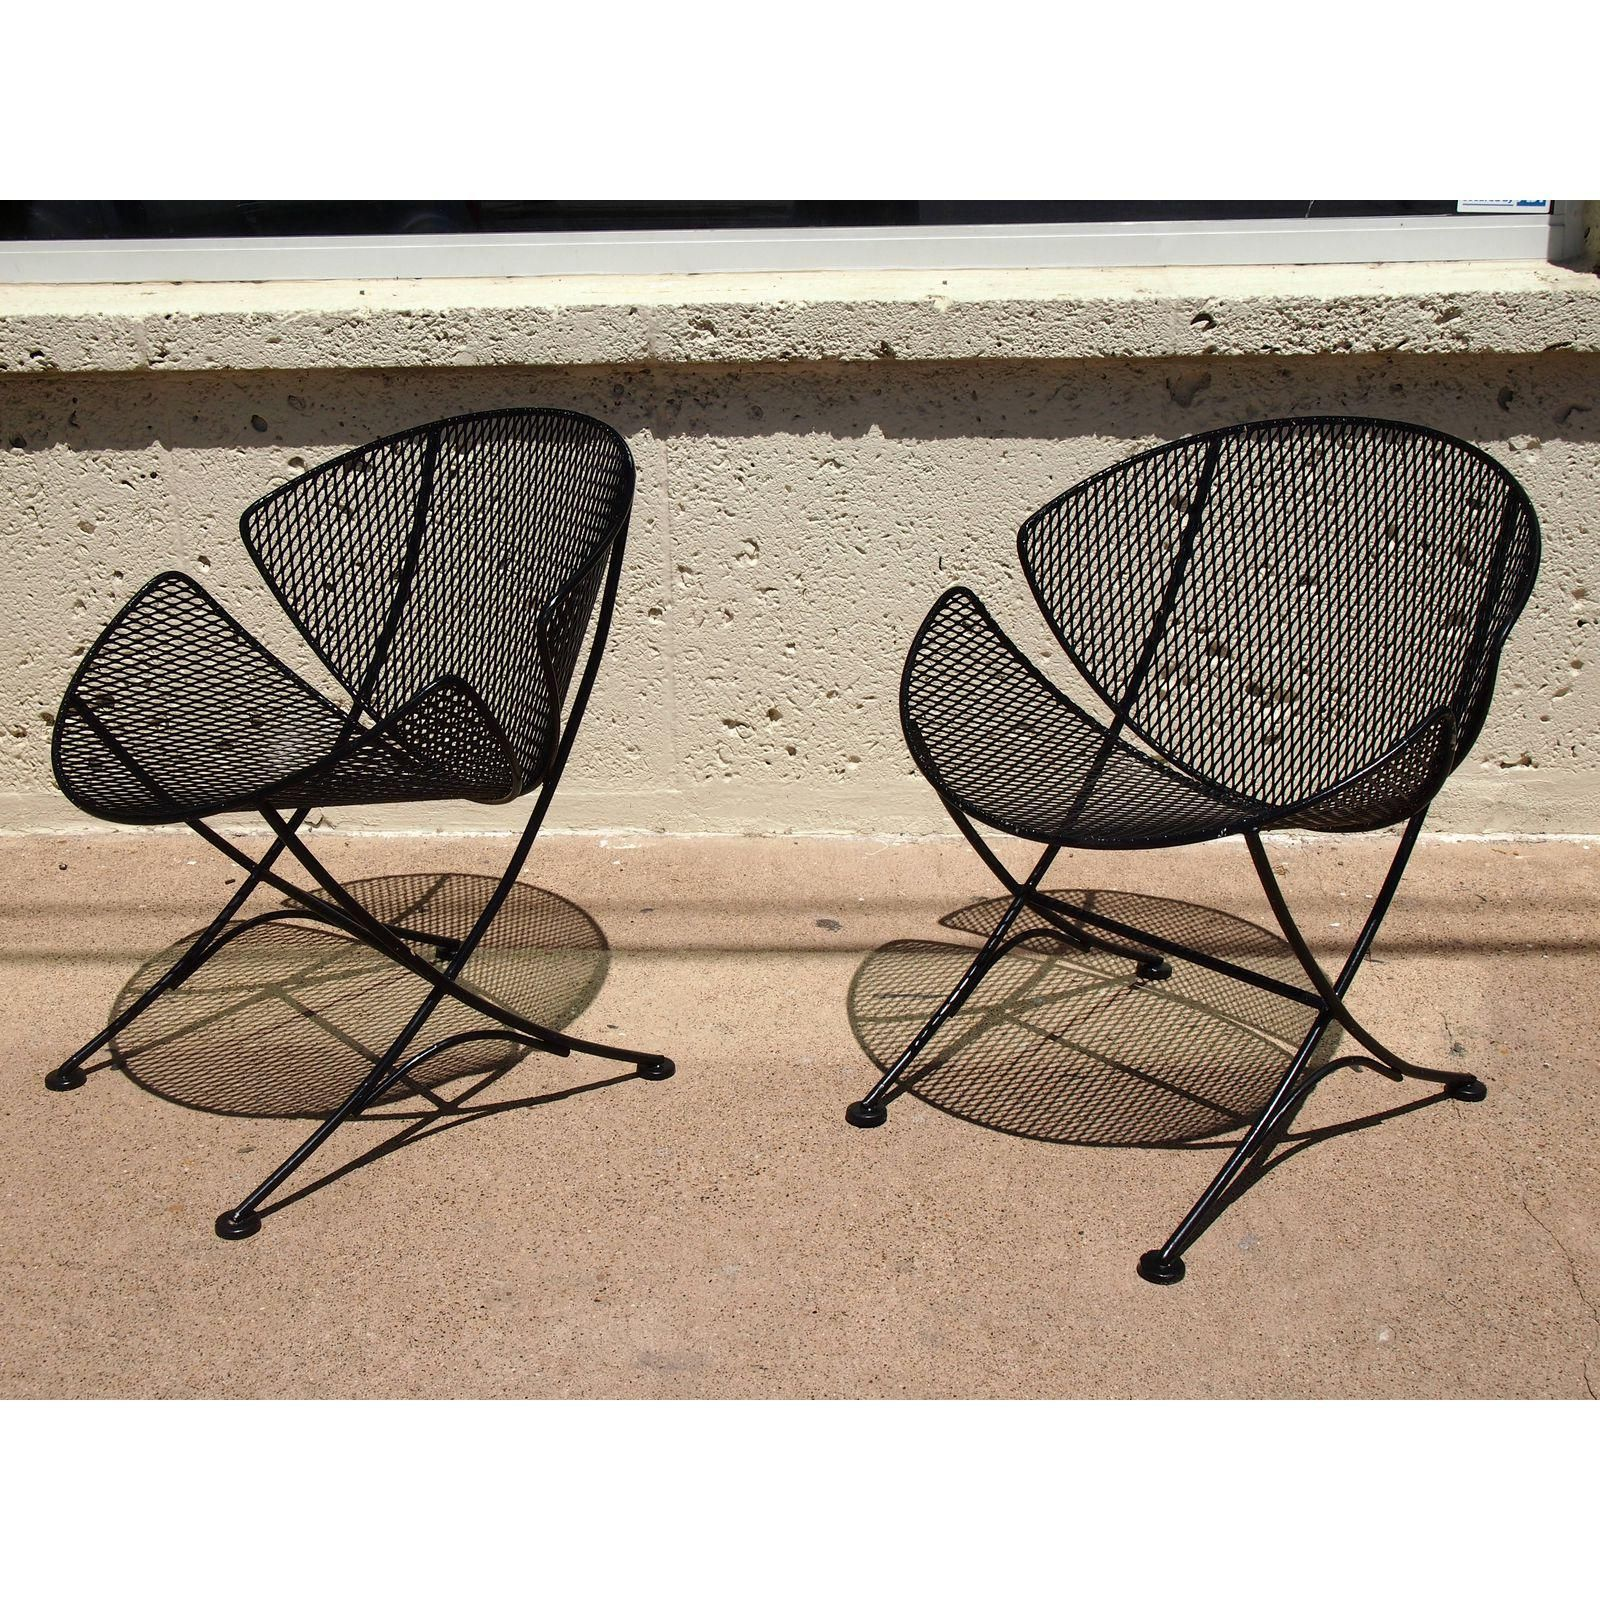 "Image of Salterini ""Slice Wrought Iron Chairs Pair"